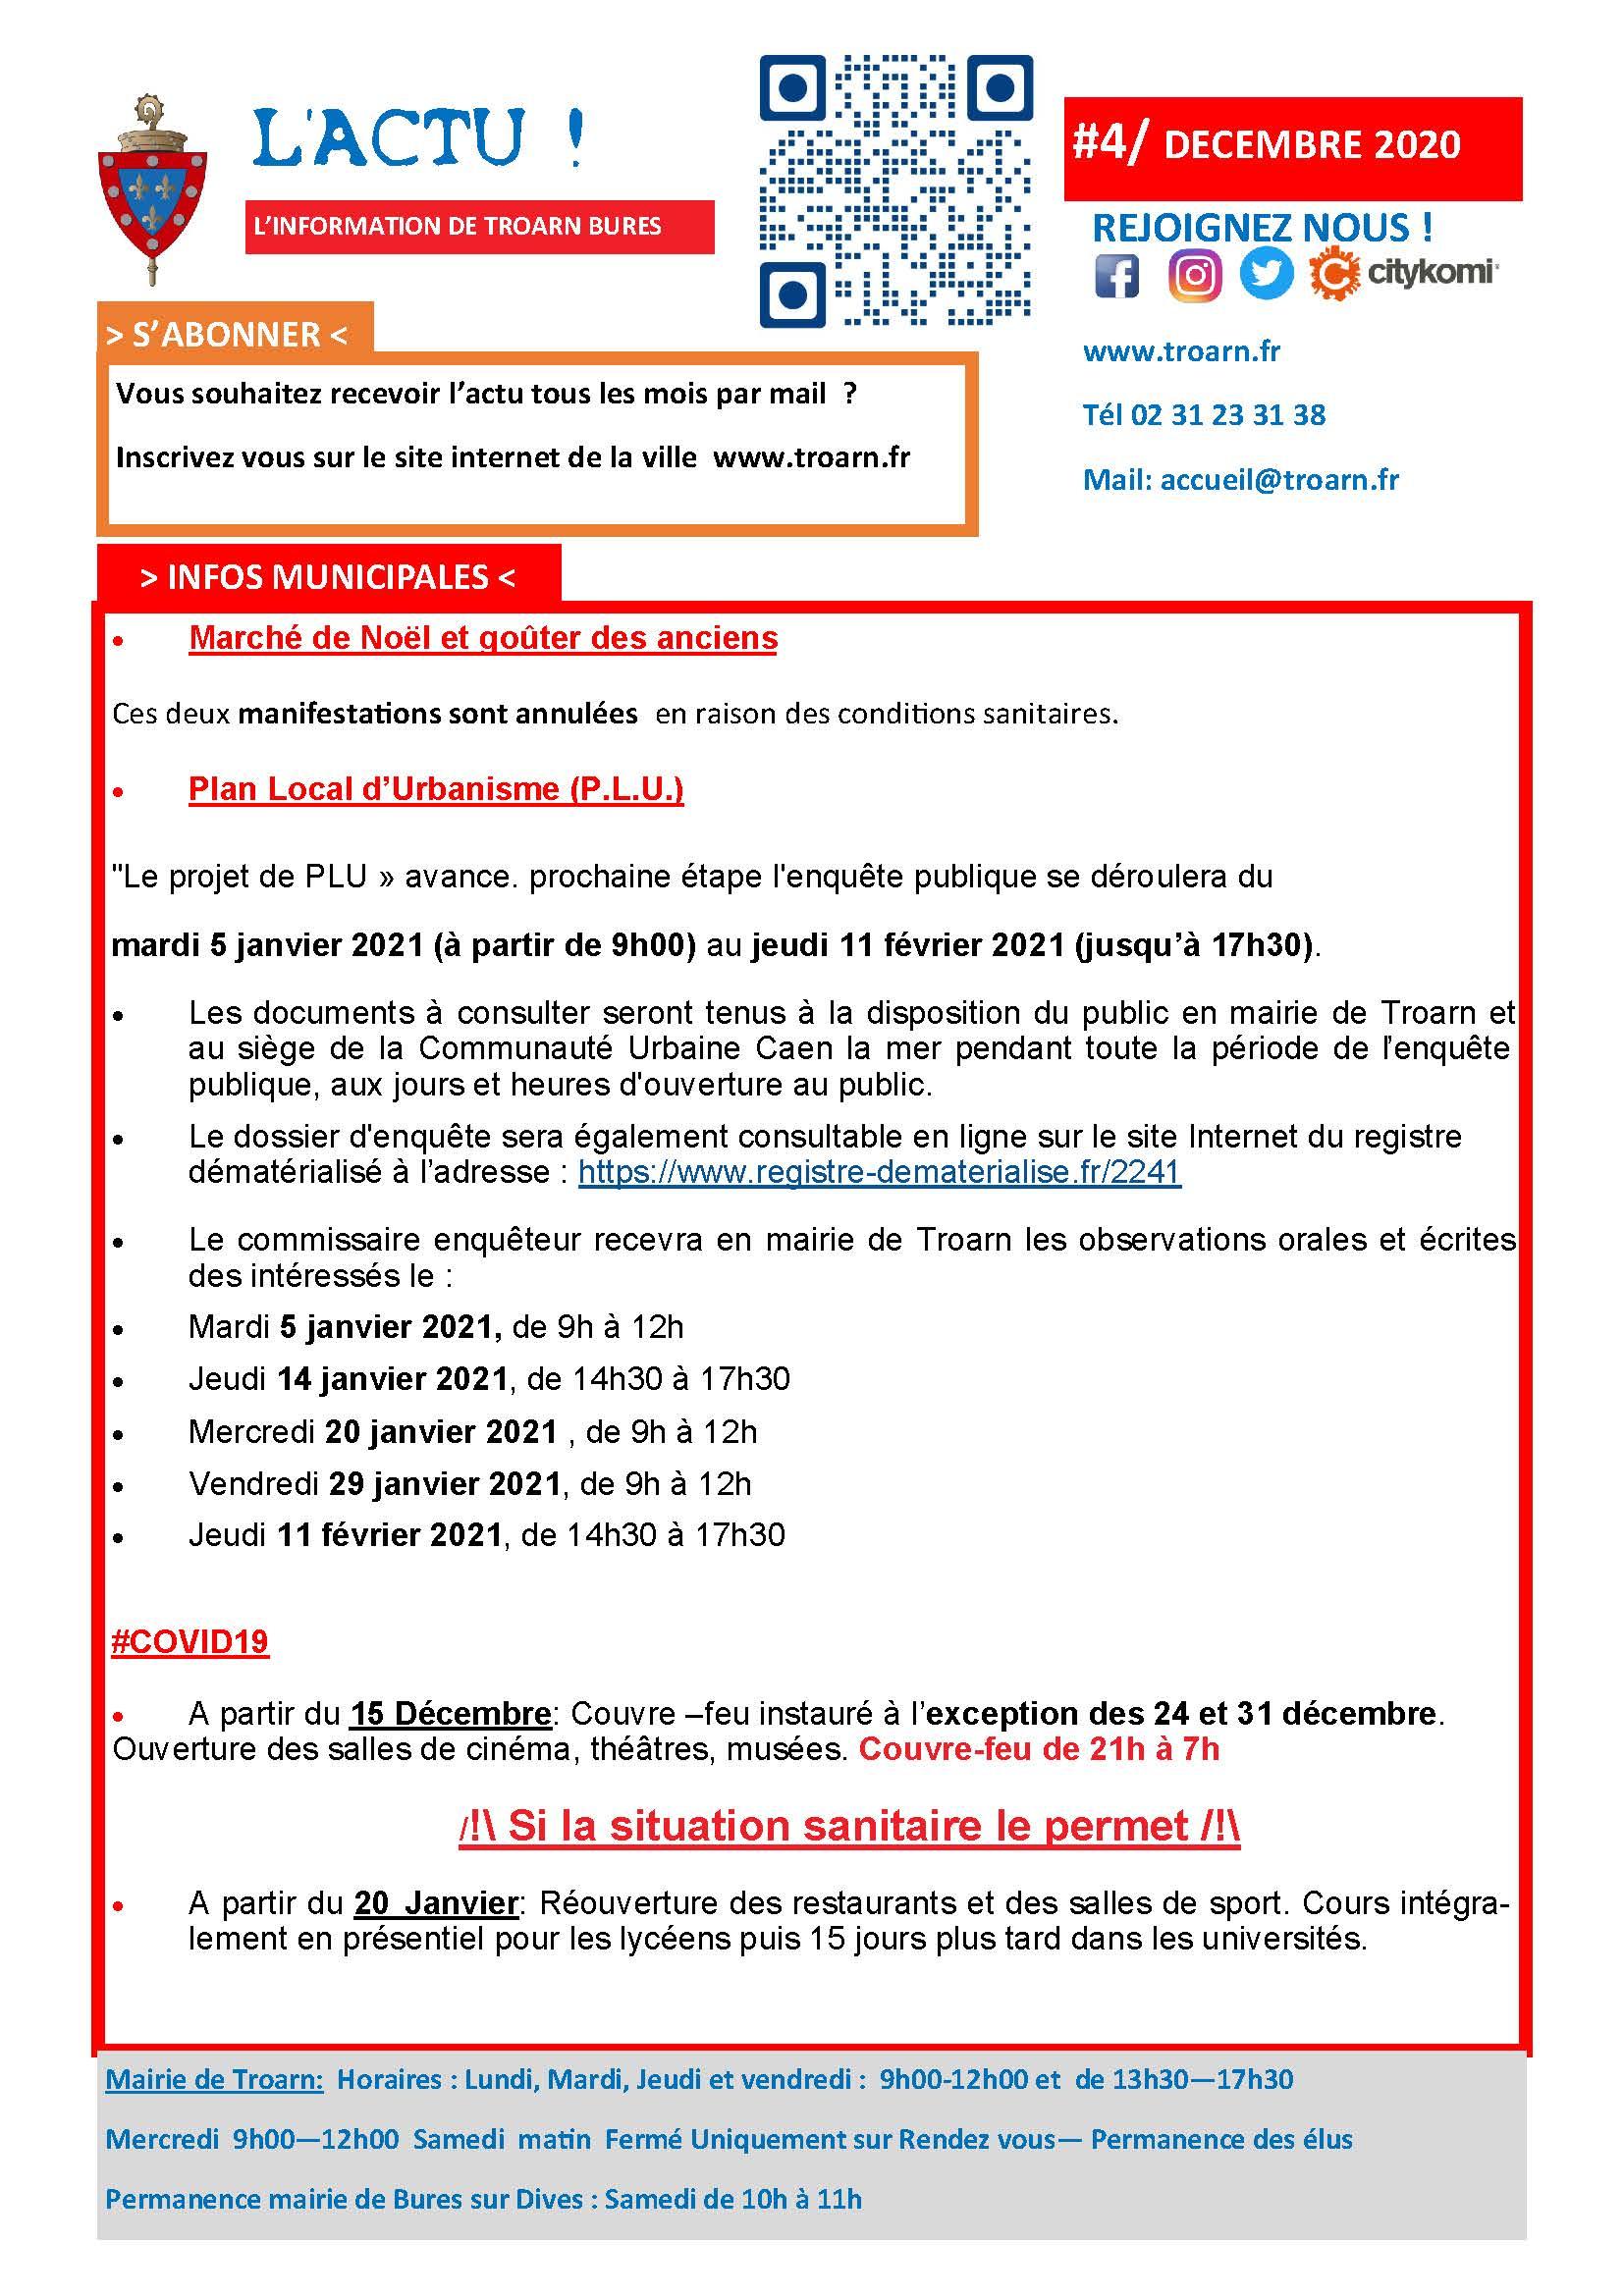 dec20_Page_1.jpg